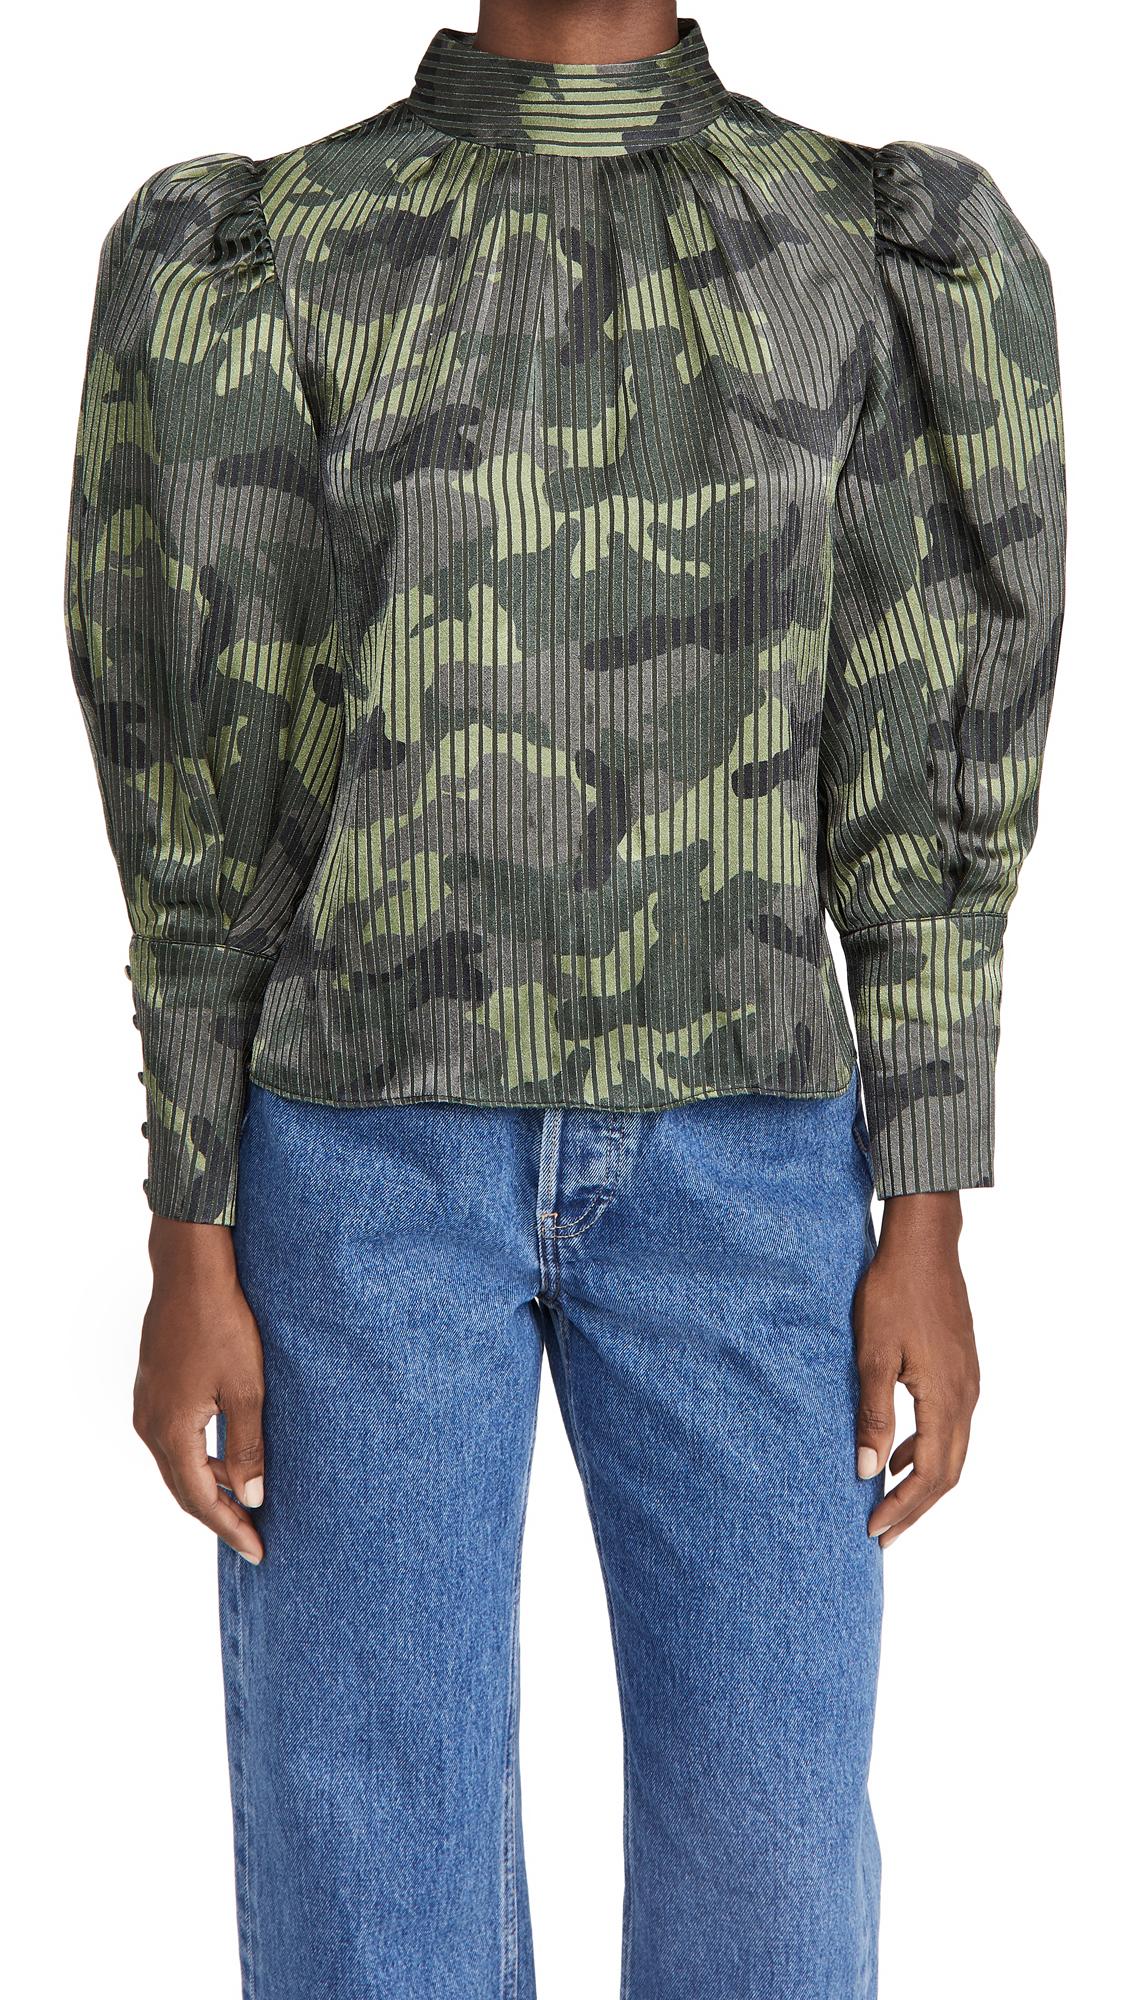 alice + olivia Winslet Long Cuff Tunic Blouse